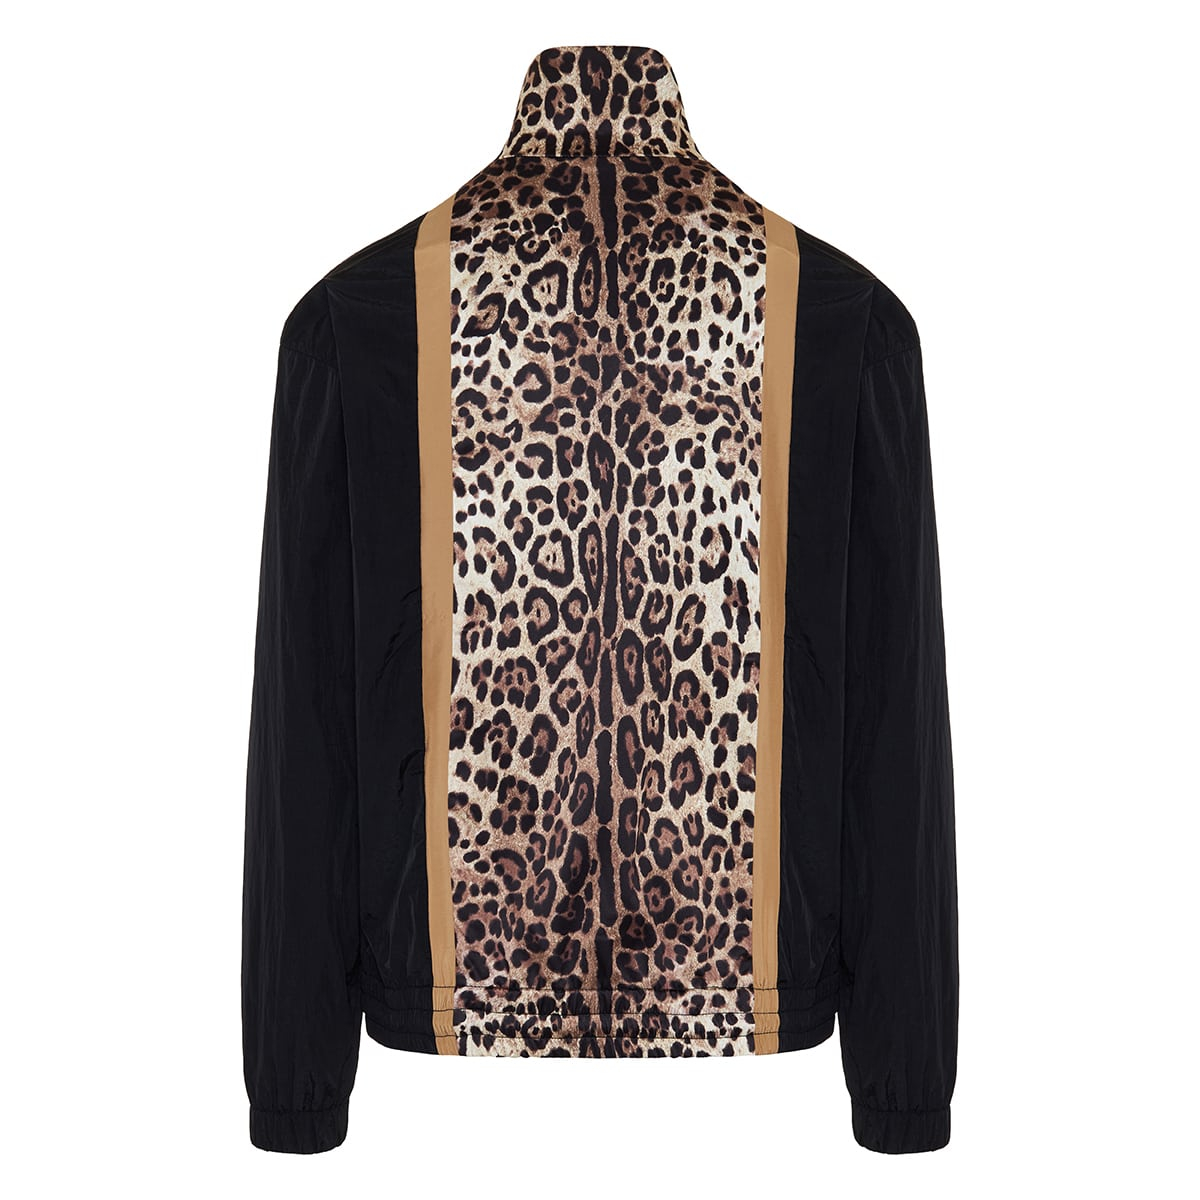 Leopard printed nylon jacket